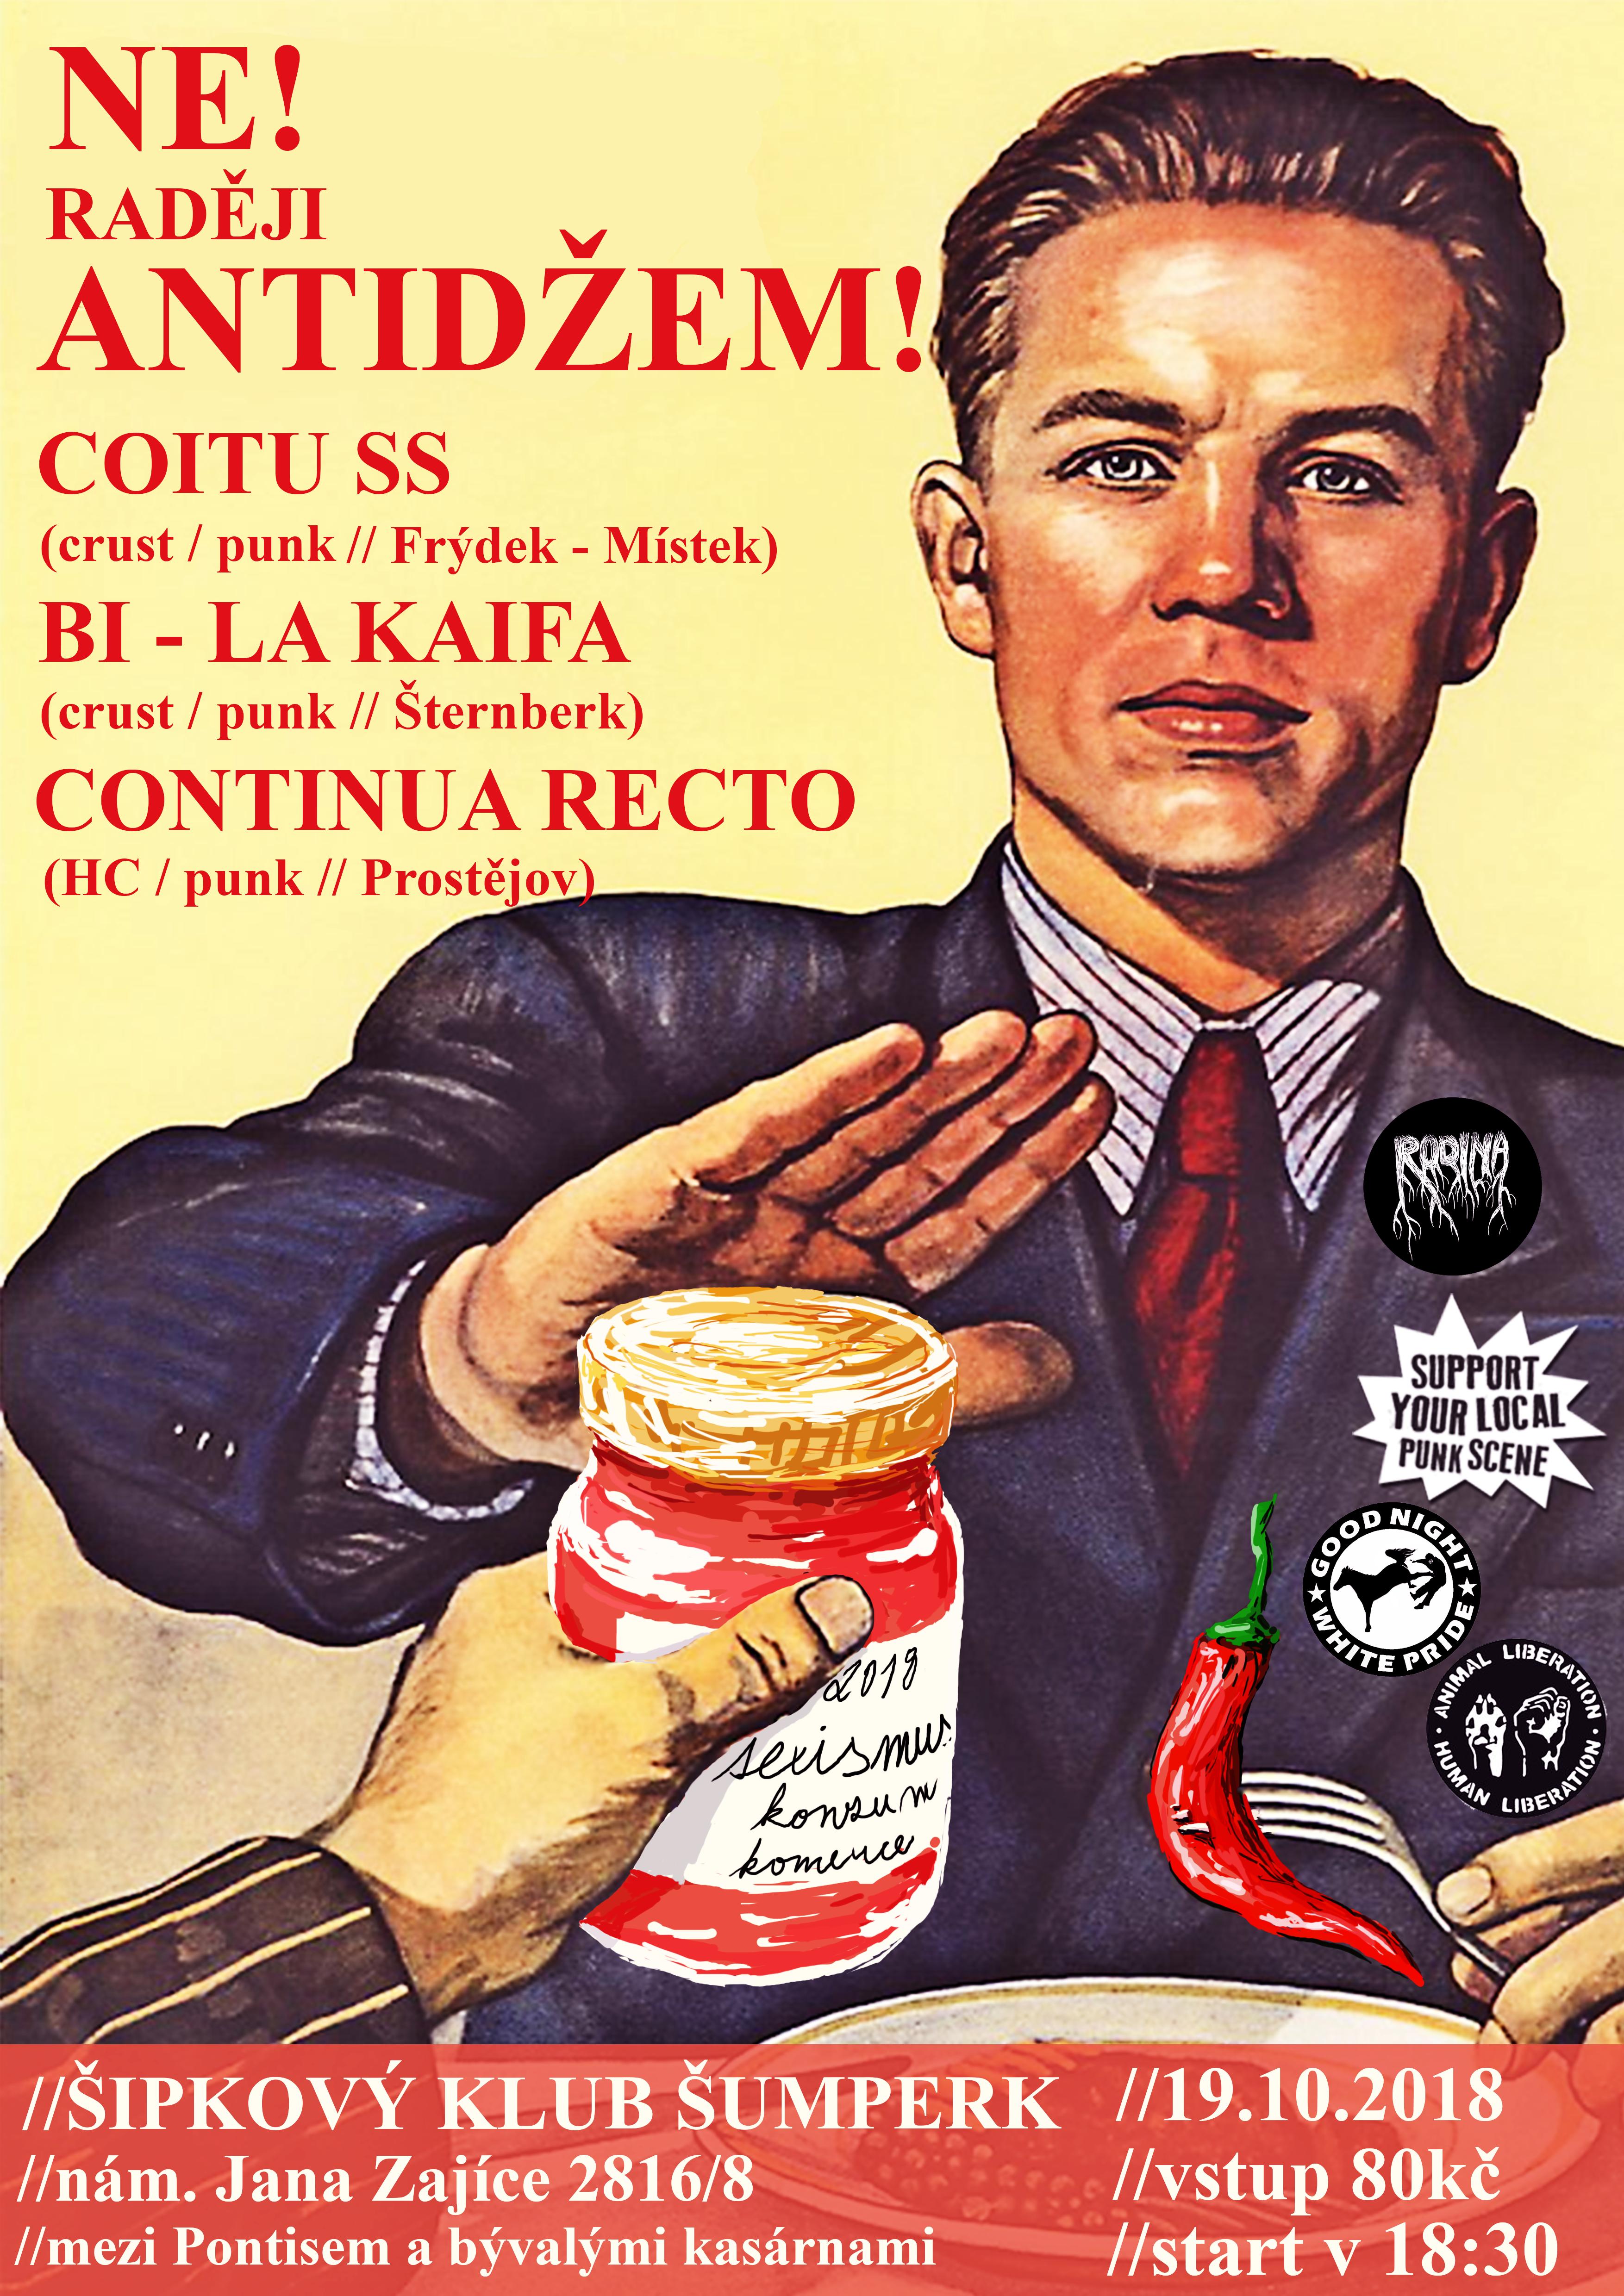 Antidžem